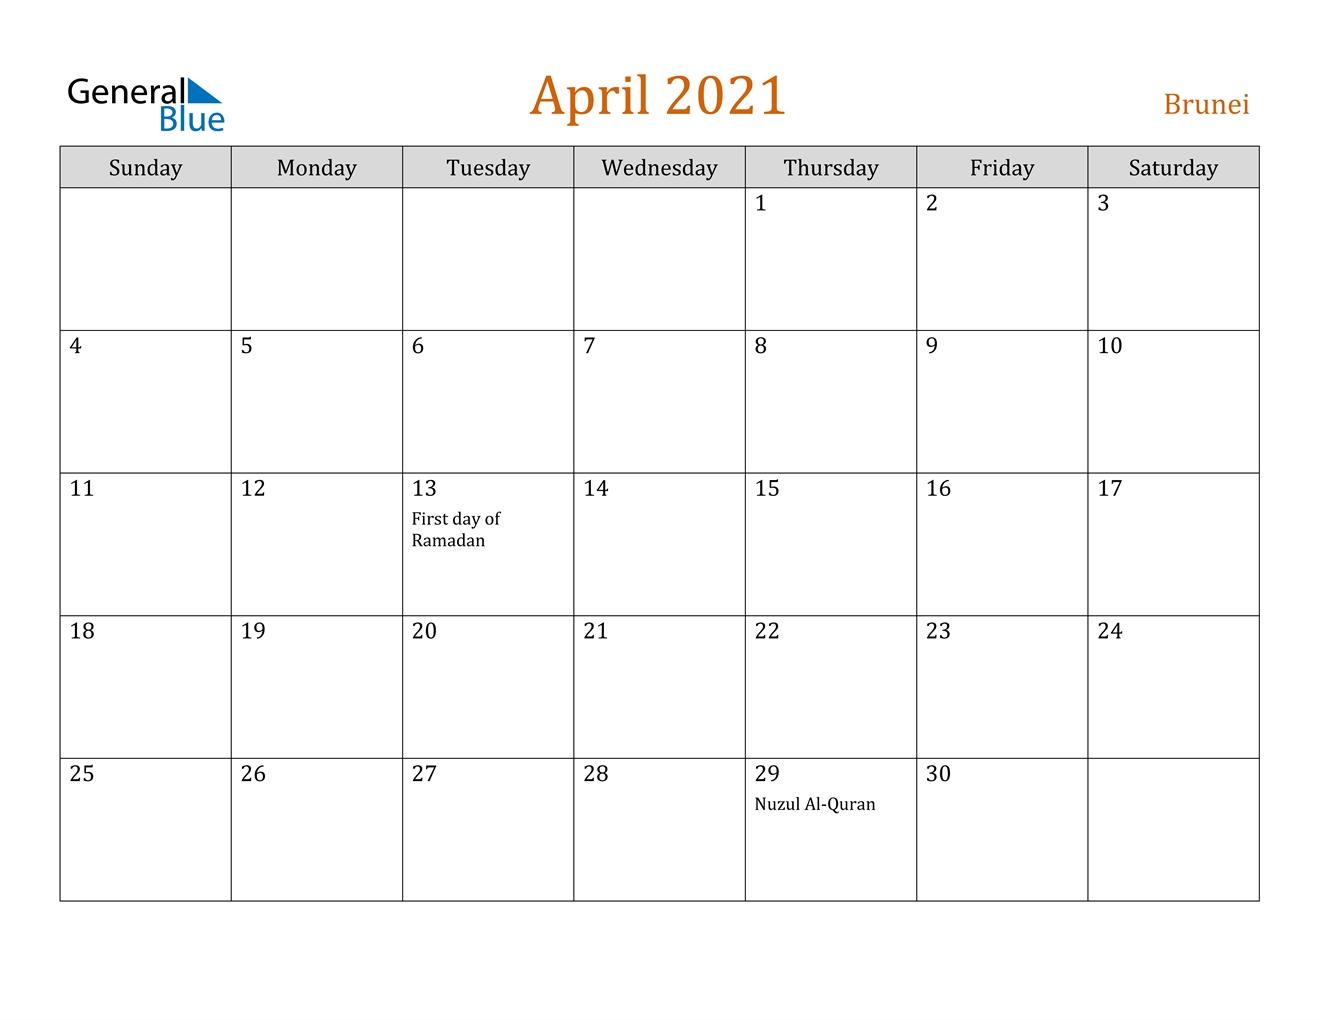 April 2021 Calendar - Brunei in Free Calendar Brunei 2021